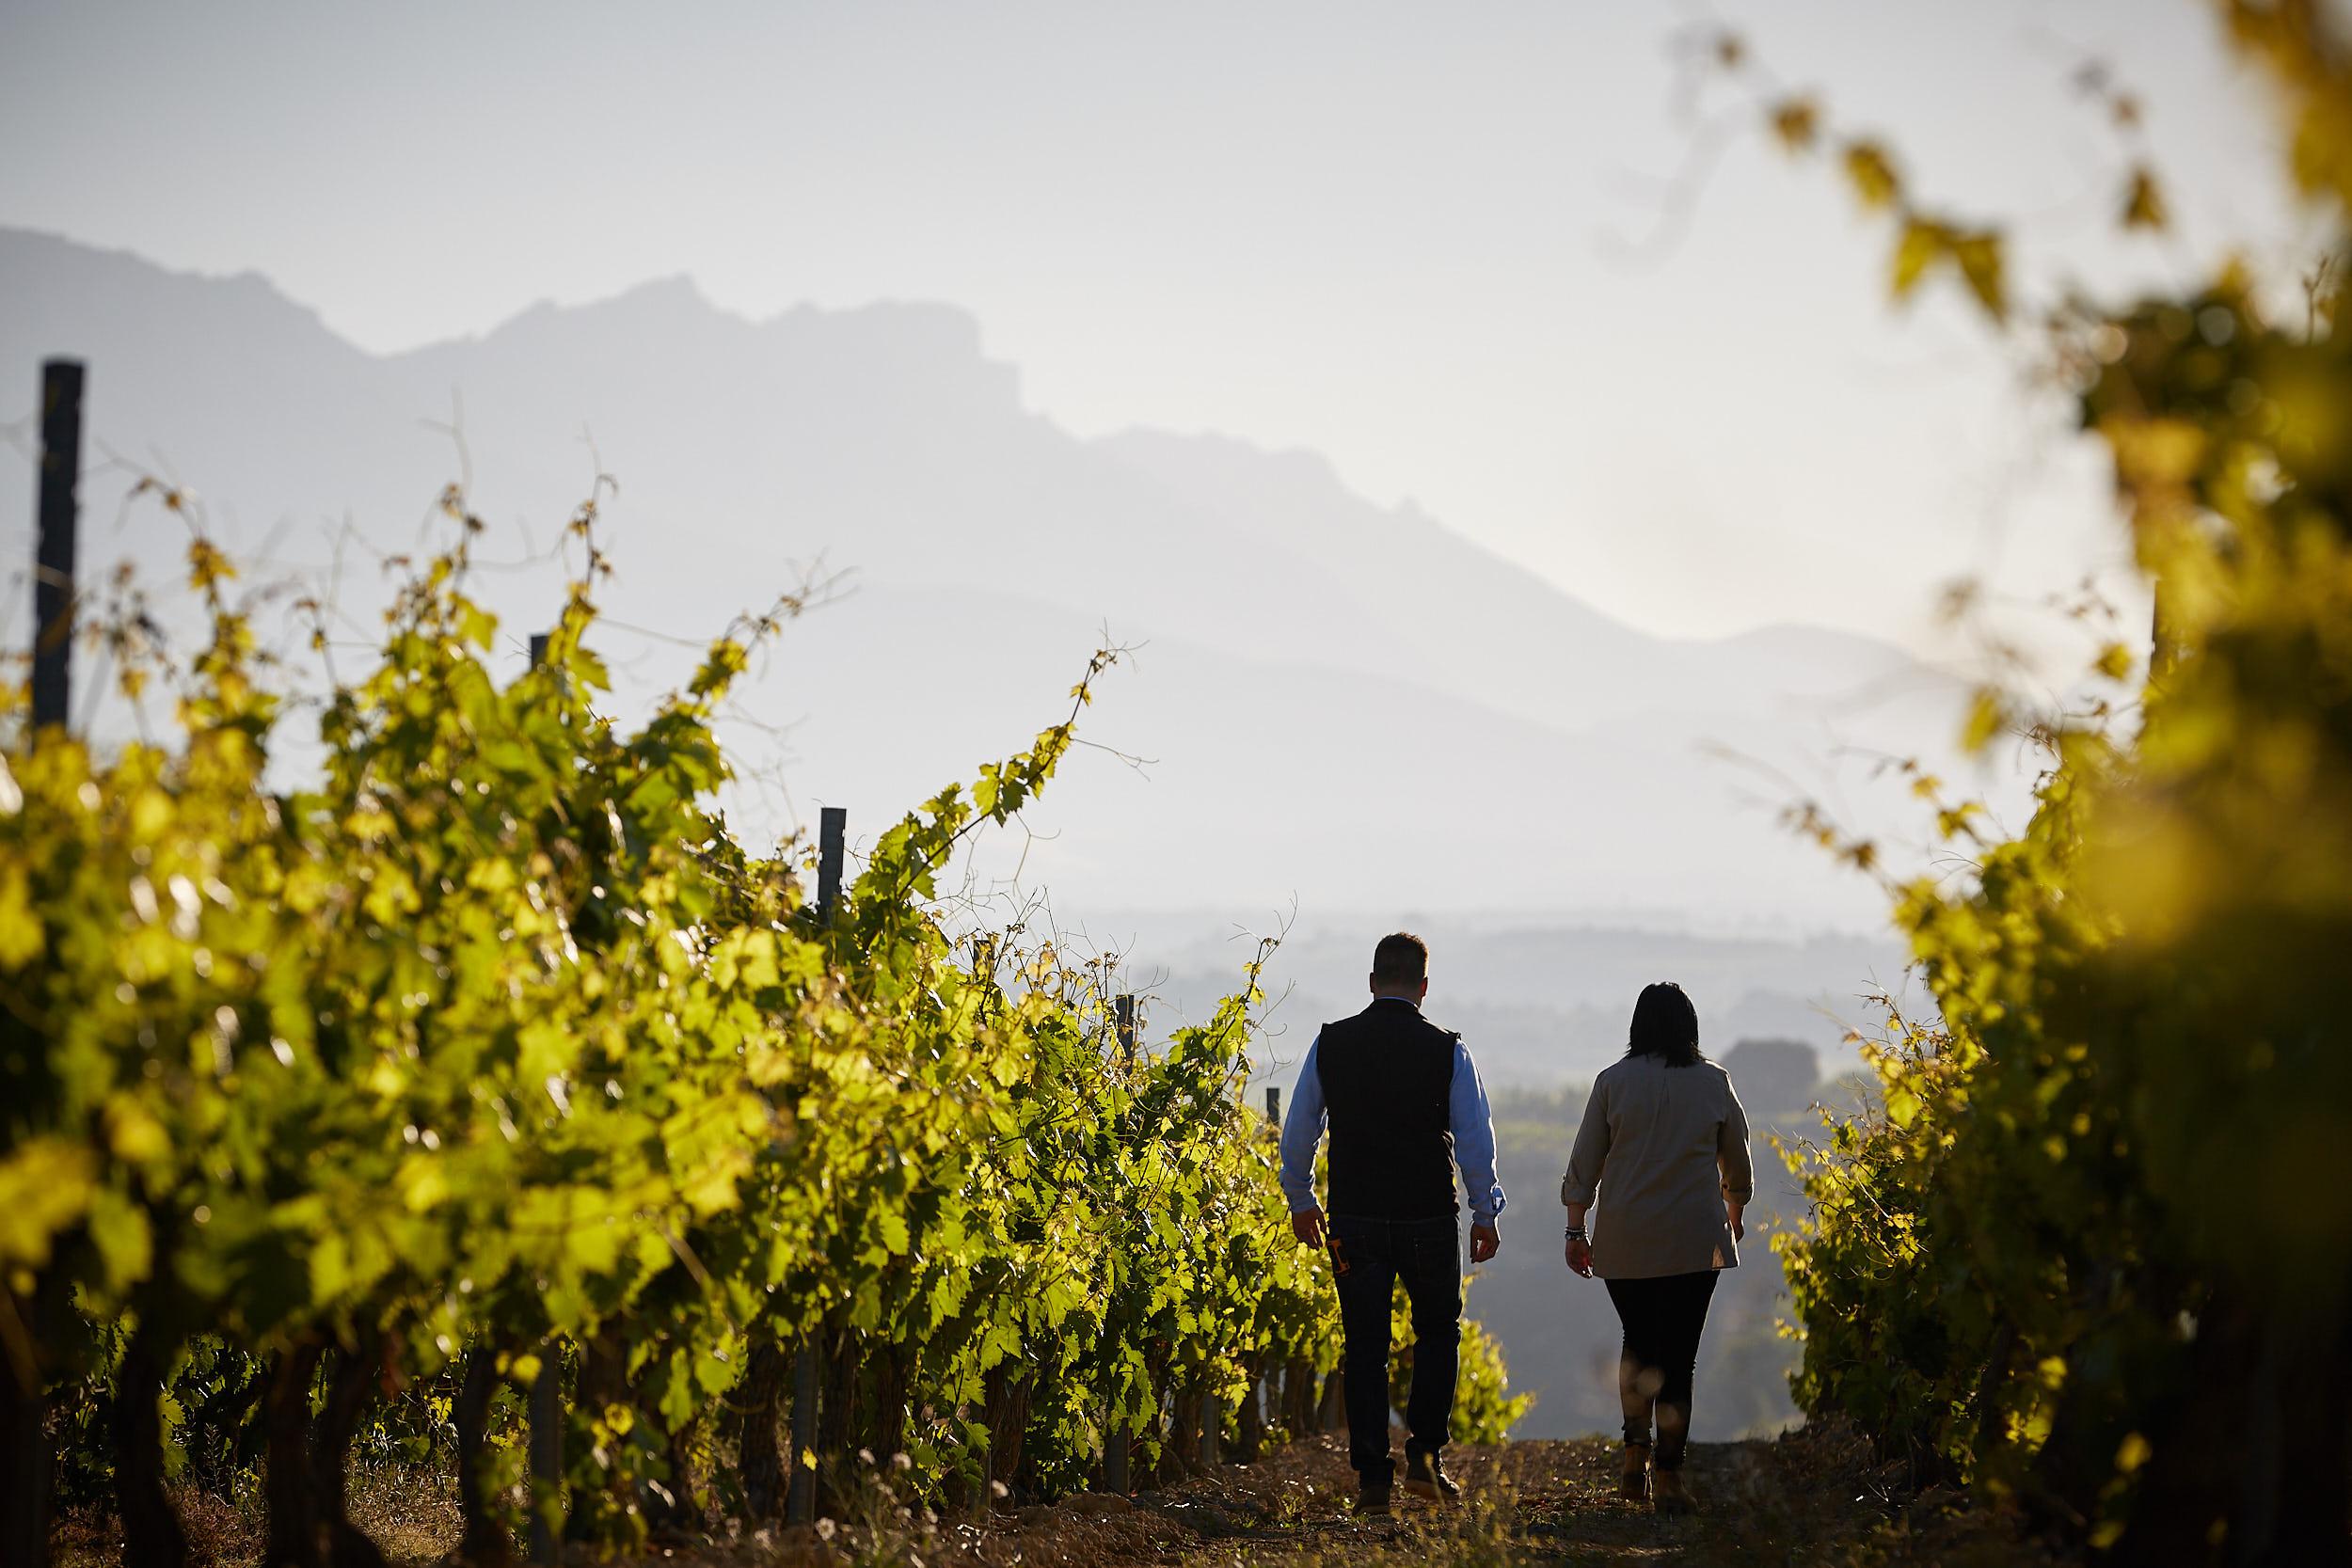 1706Commercial-professional-wine-photography-la-rioja-spain-James-Sturcke_0001.jpg